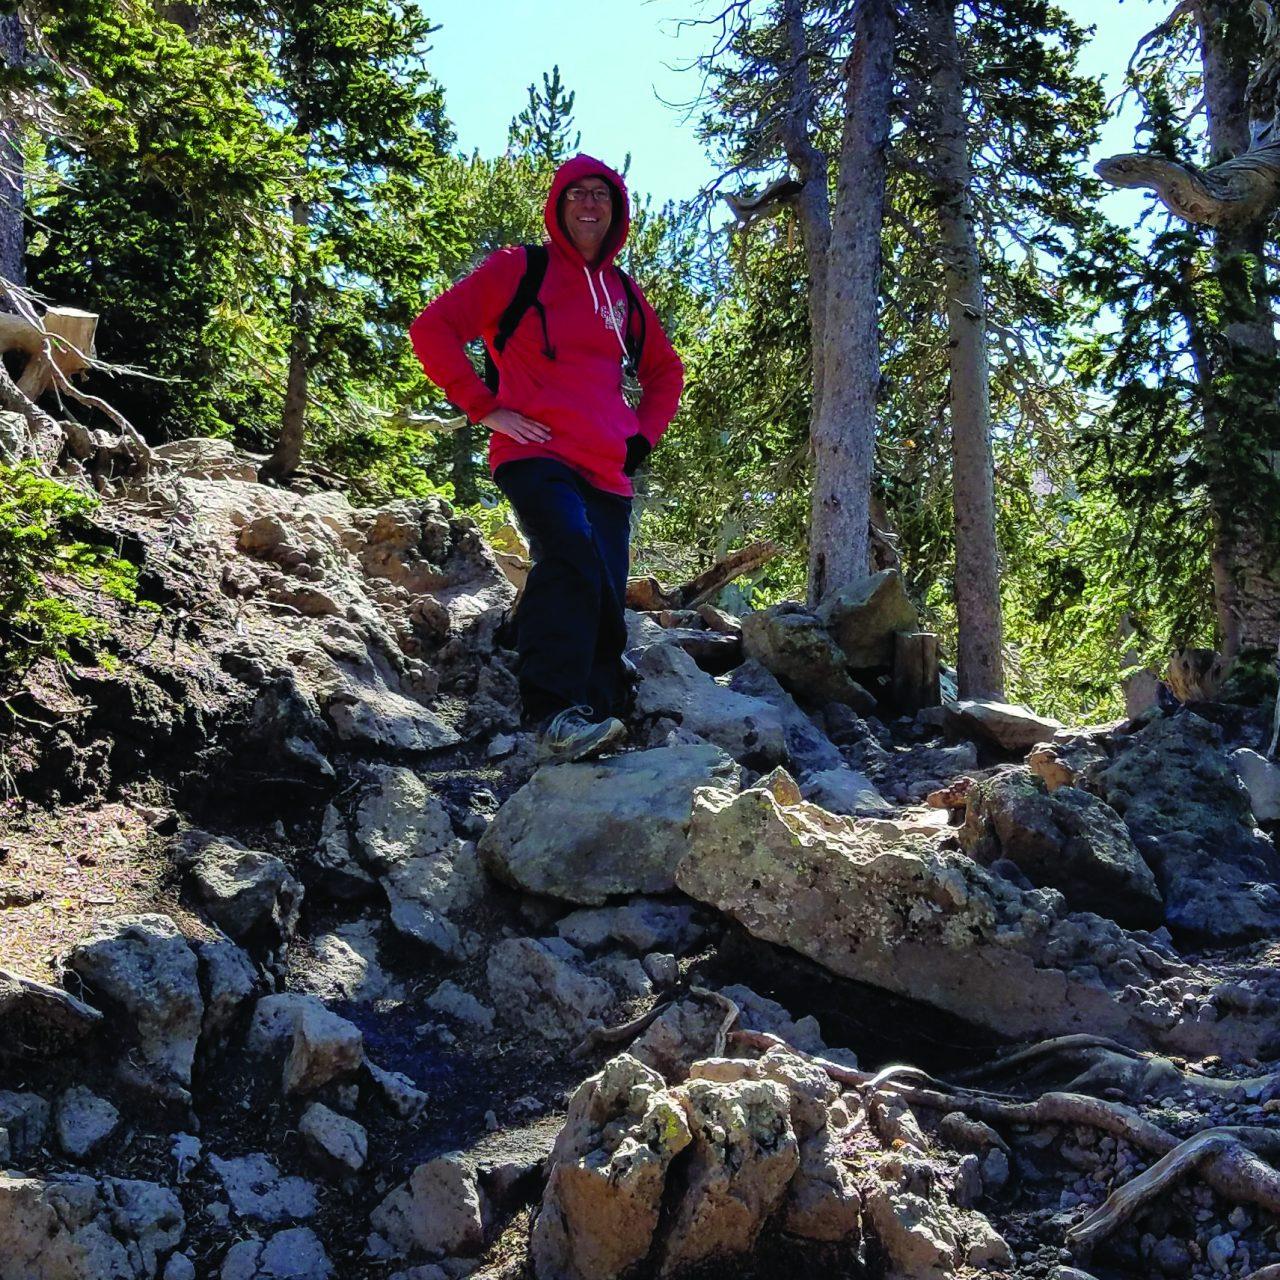 Steve Horvat's Hiking Journey